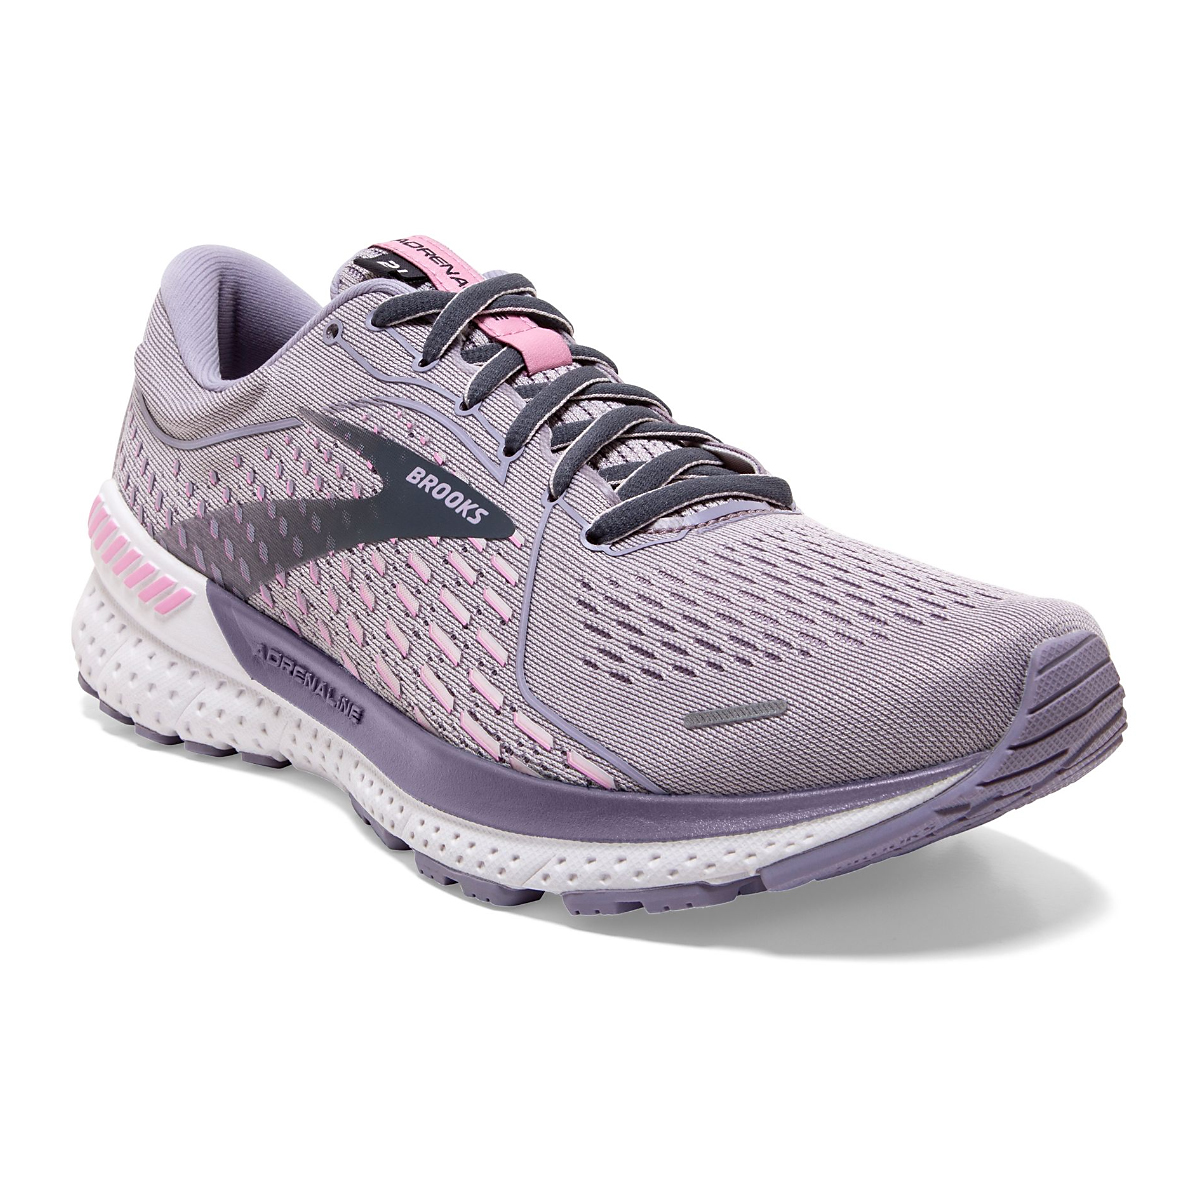 Women's Brooks Adrenaline GTS 21 Running Shoe - Color: Iris/Lilac  - Size: 5 - Width: Regular, Iris/Lilac, large, image 4